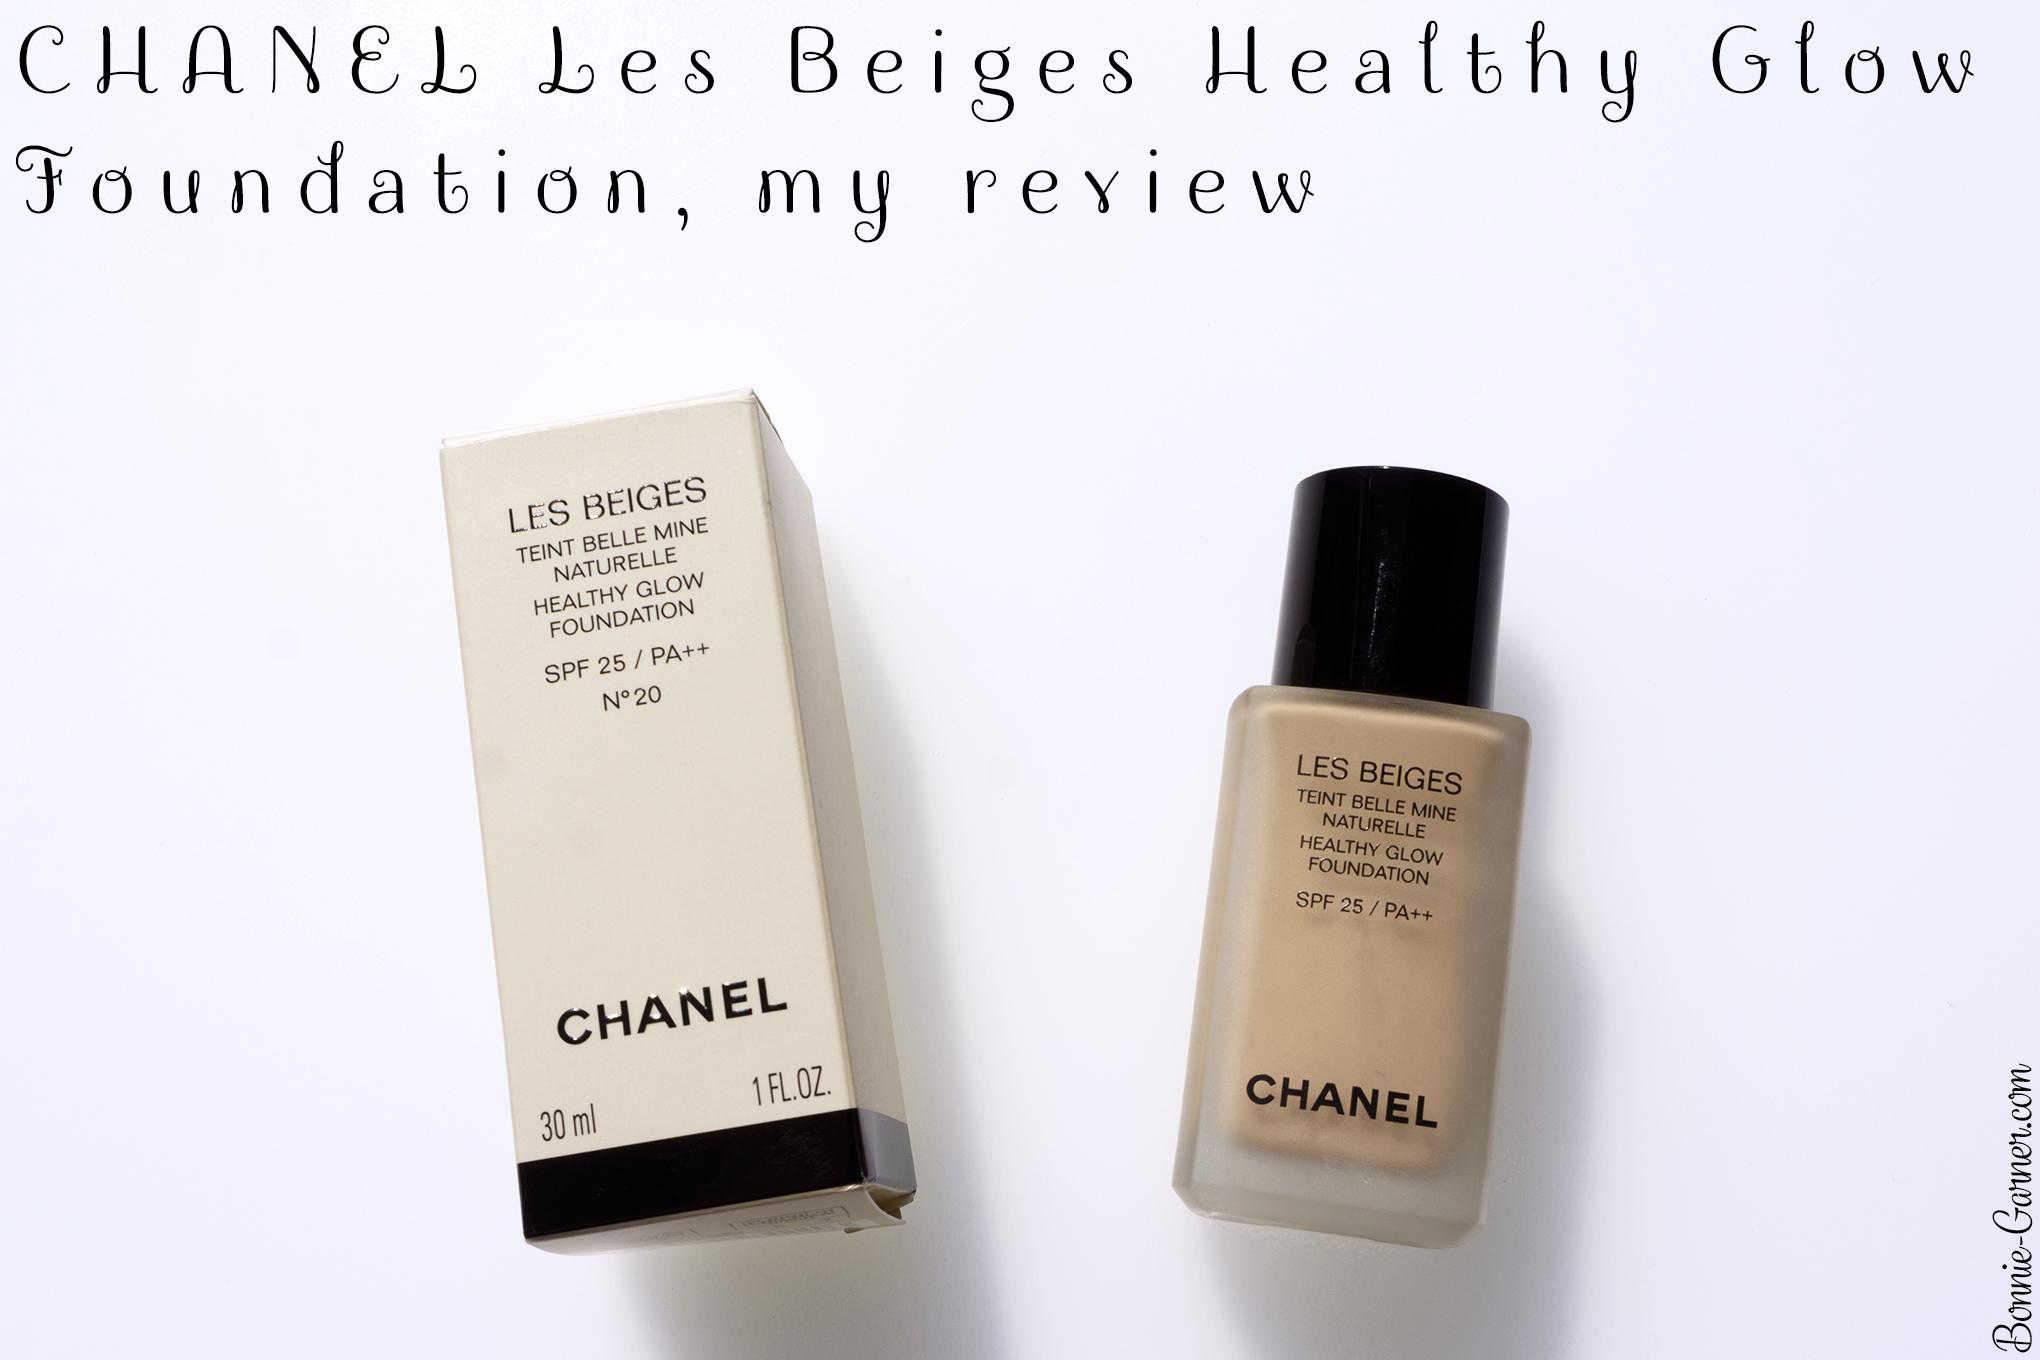 Chanel Les Beiges Healthy Glow Foundation My Review Bonnie Garner Skincare Makeup Nails